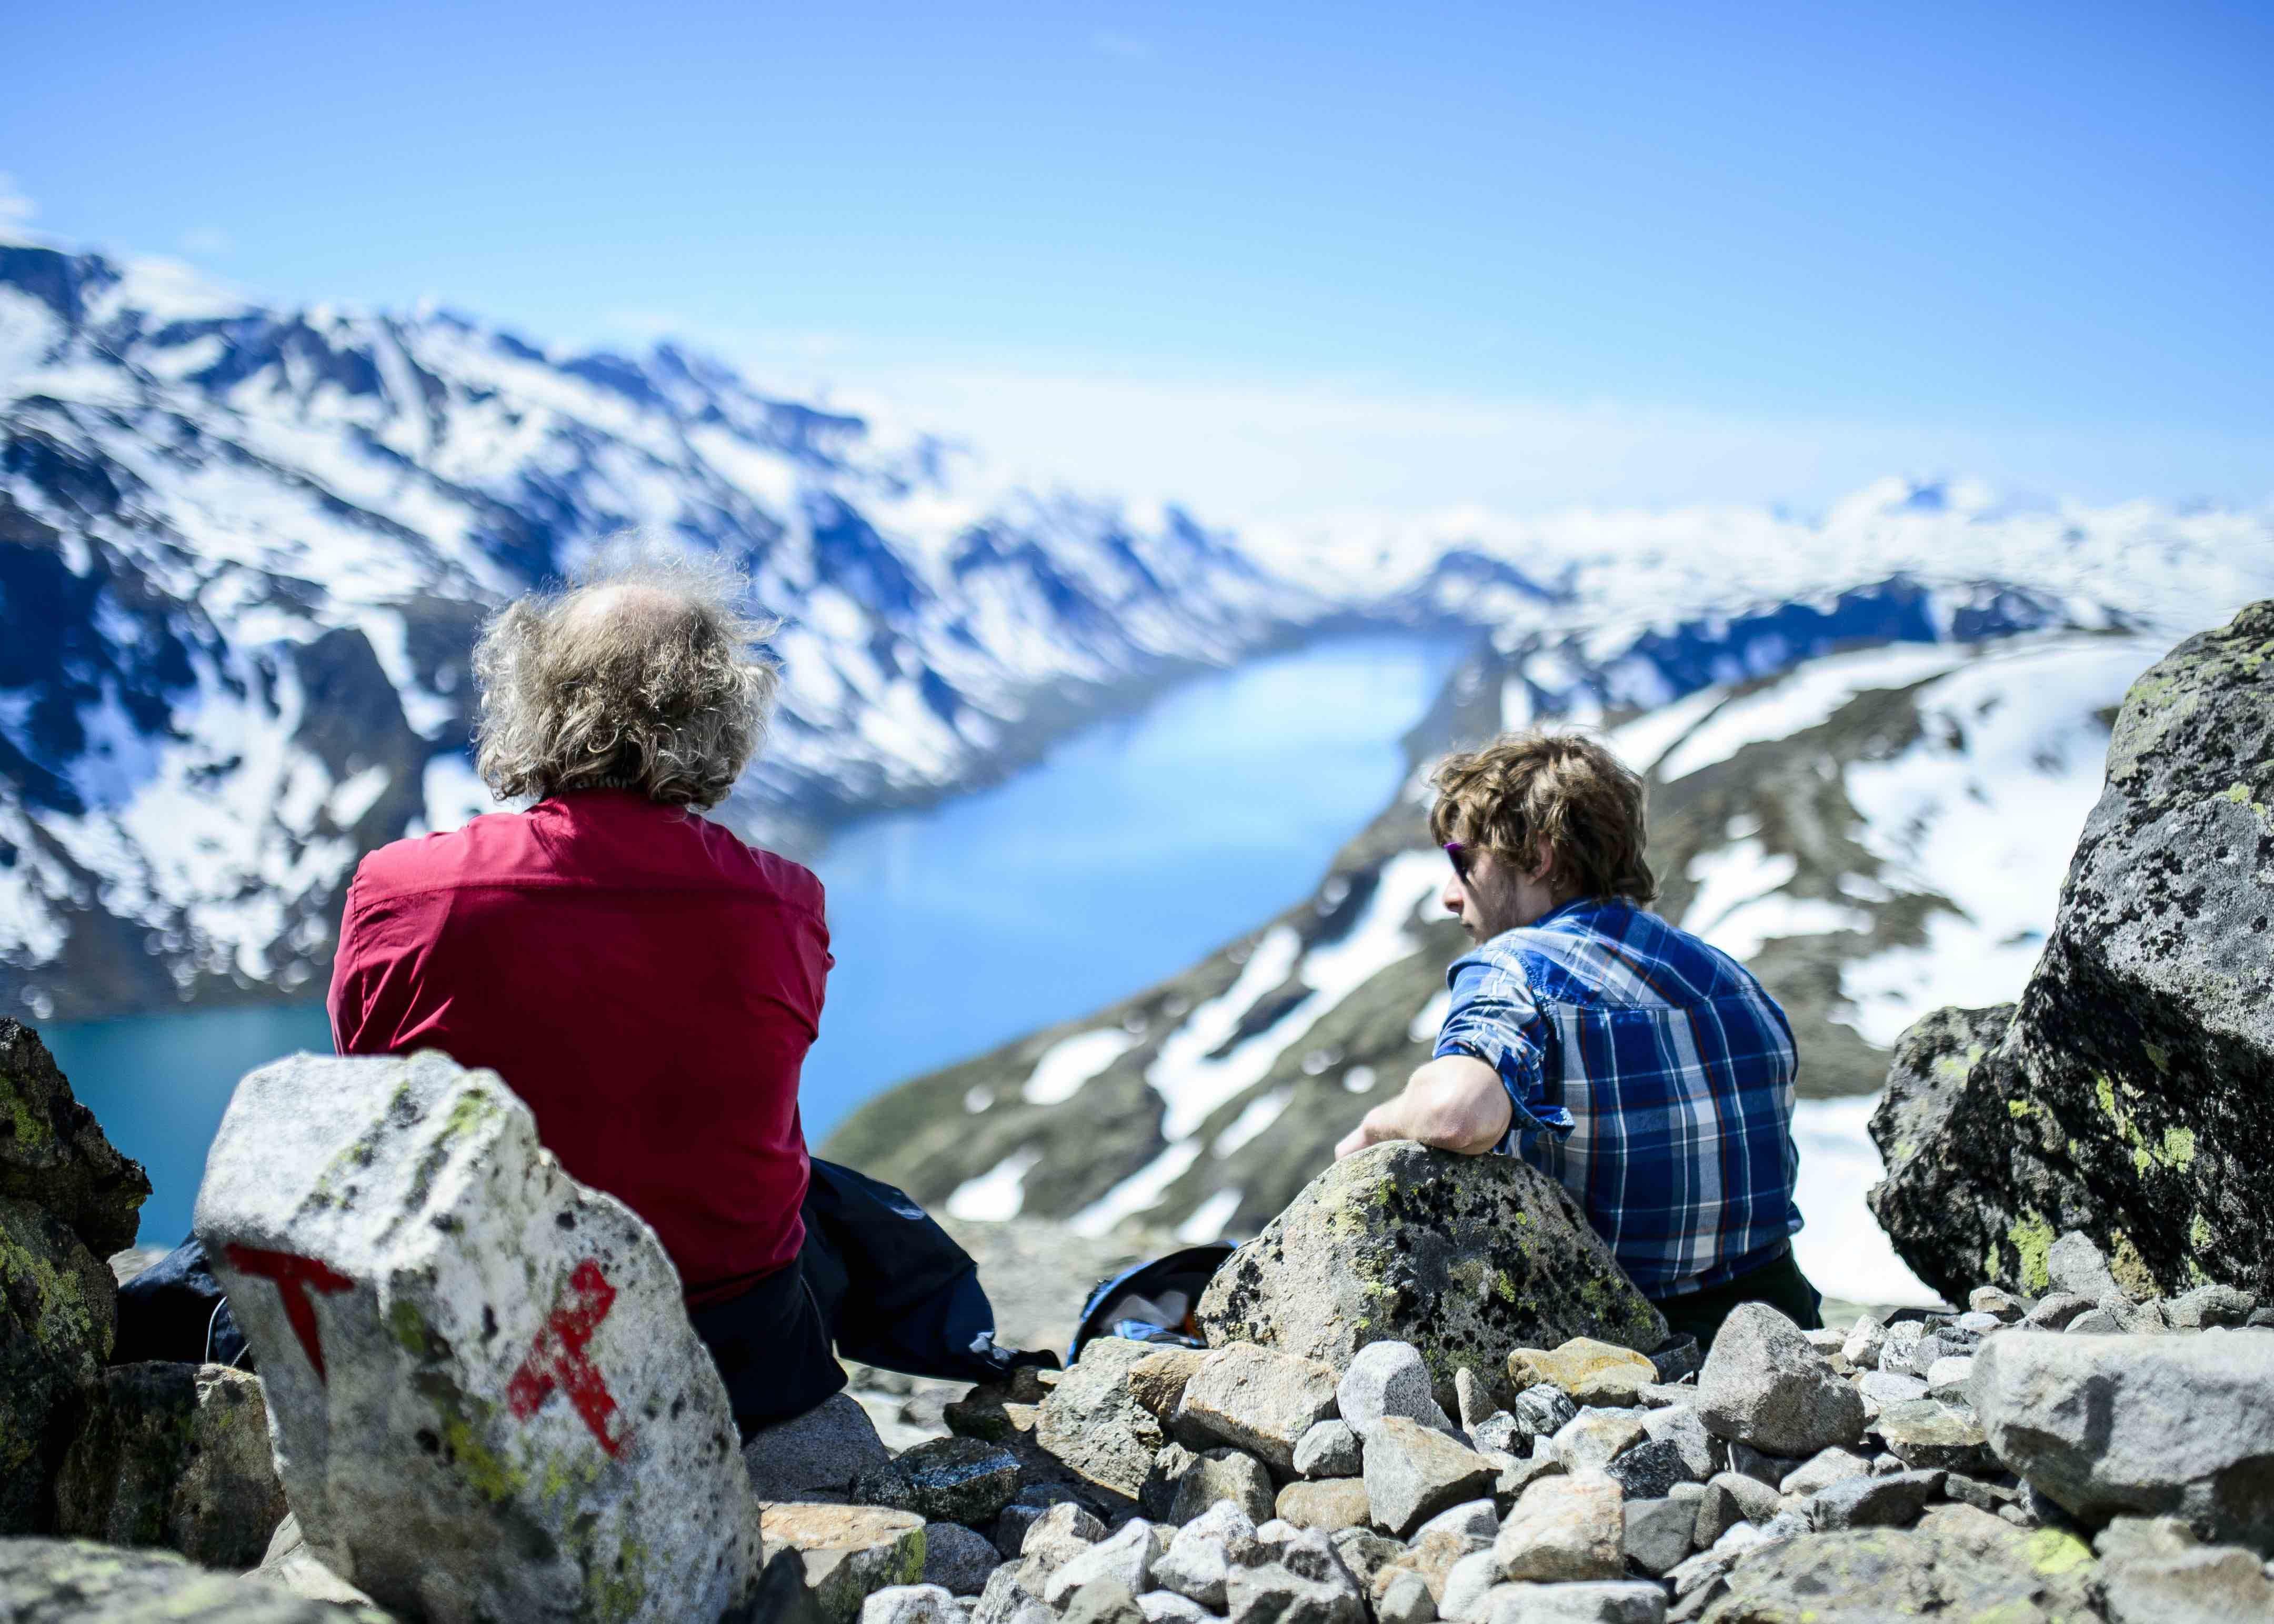 Marius Dalseg/Turistforeningen, Jotunheimen Fjellfestival